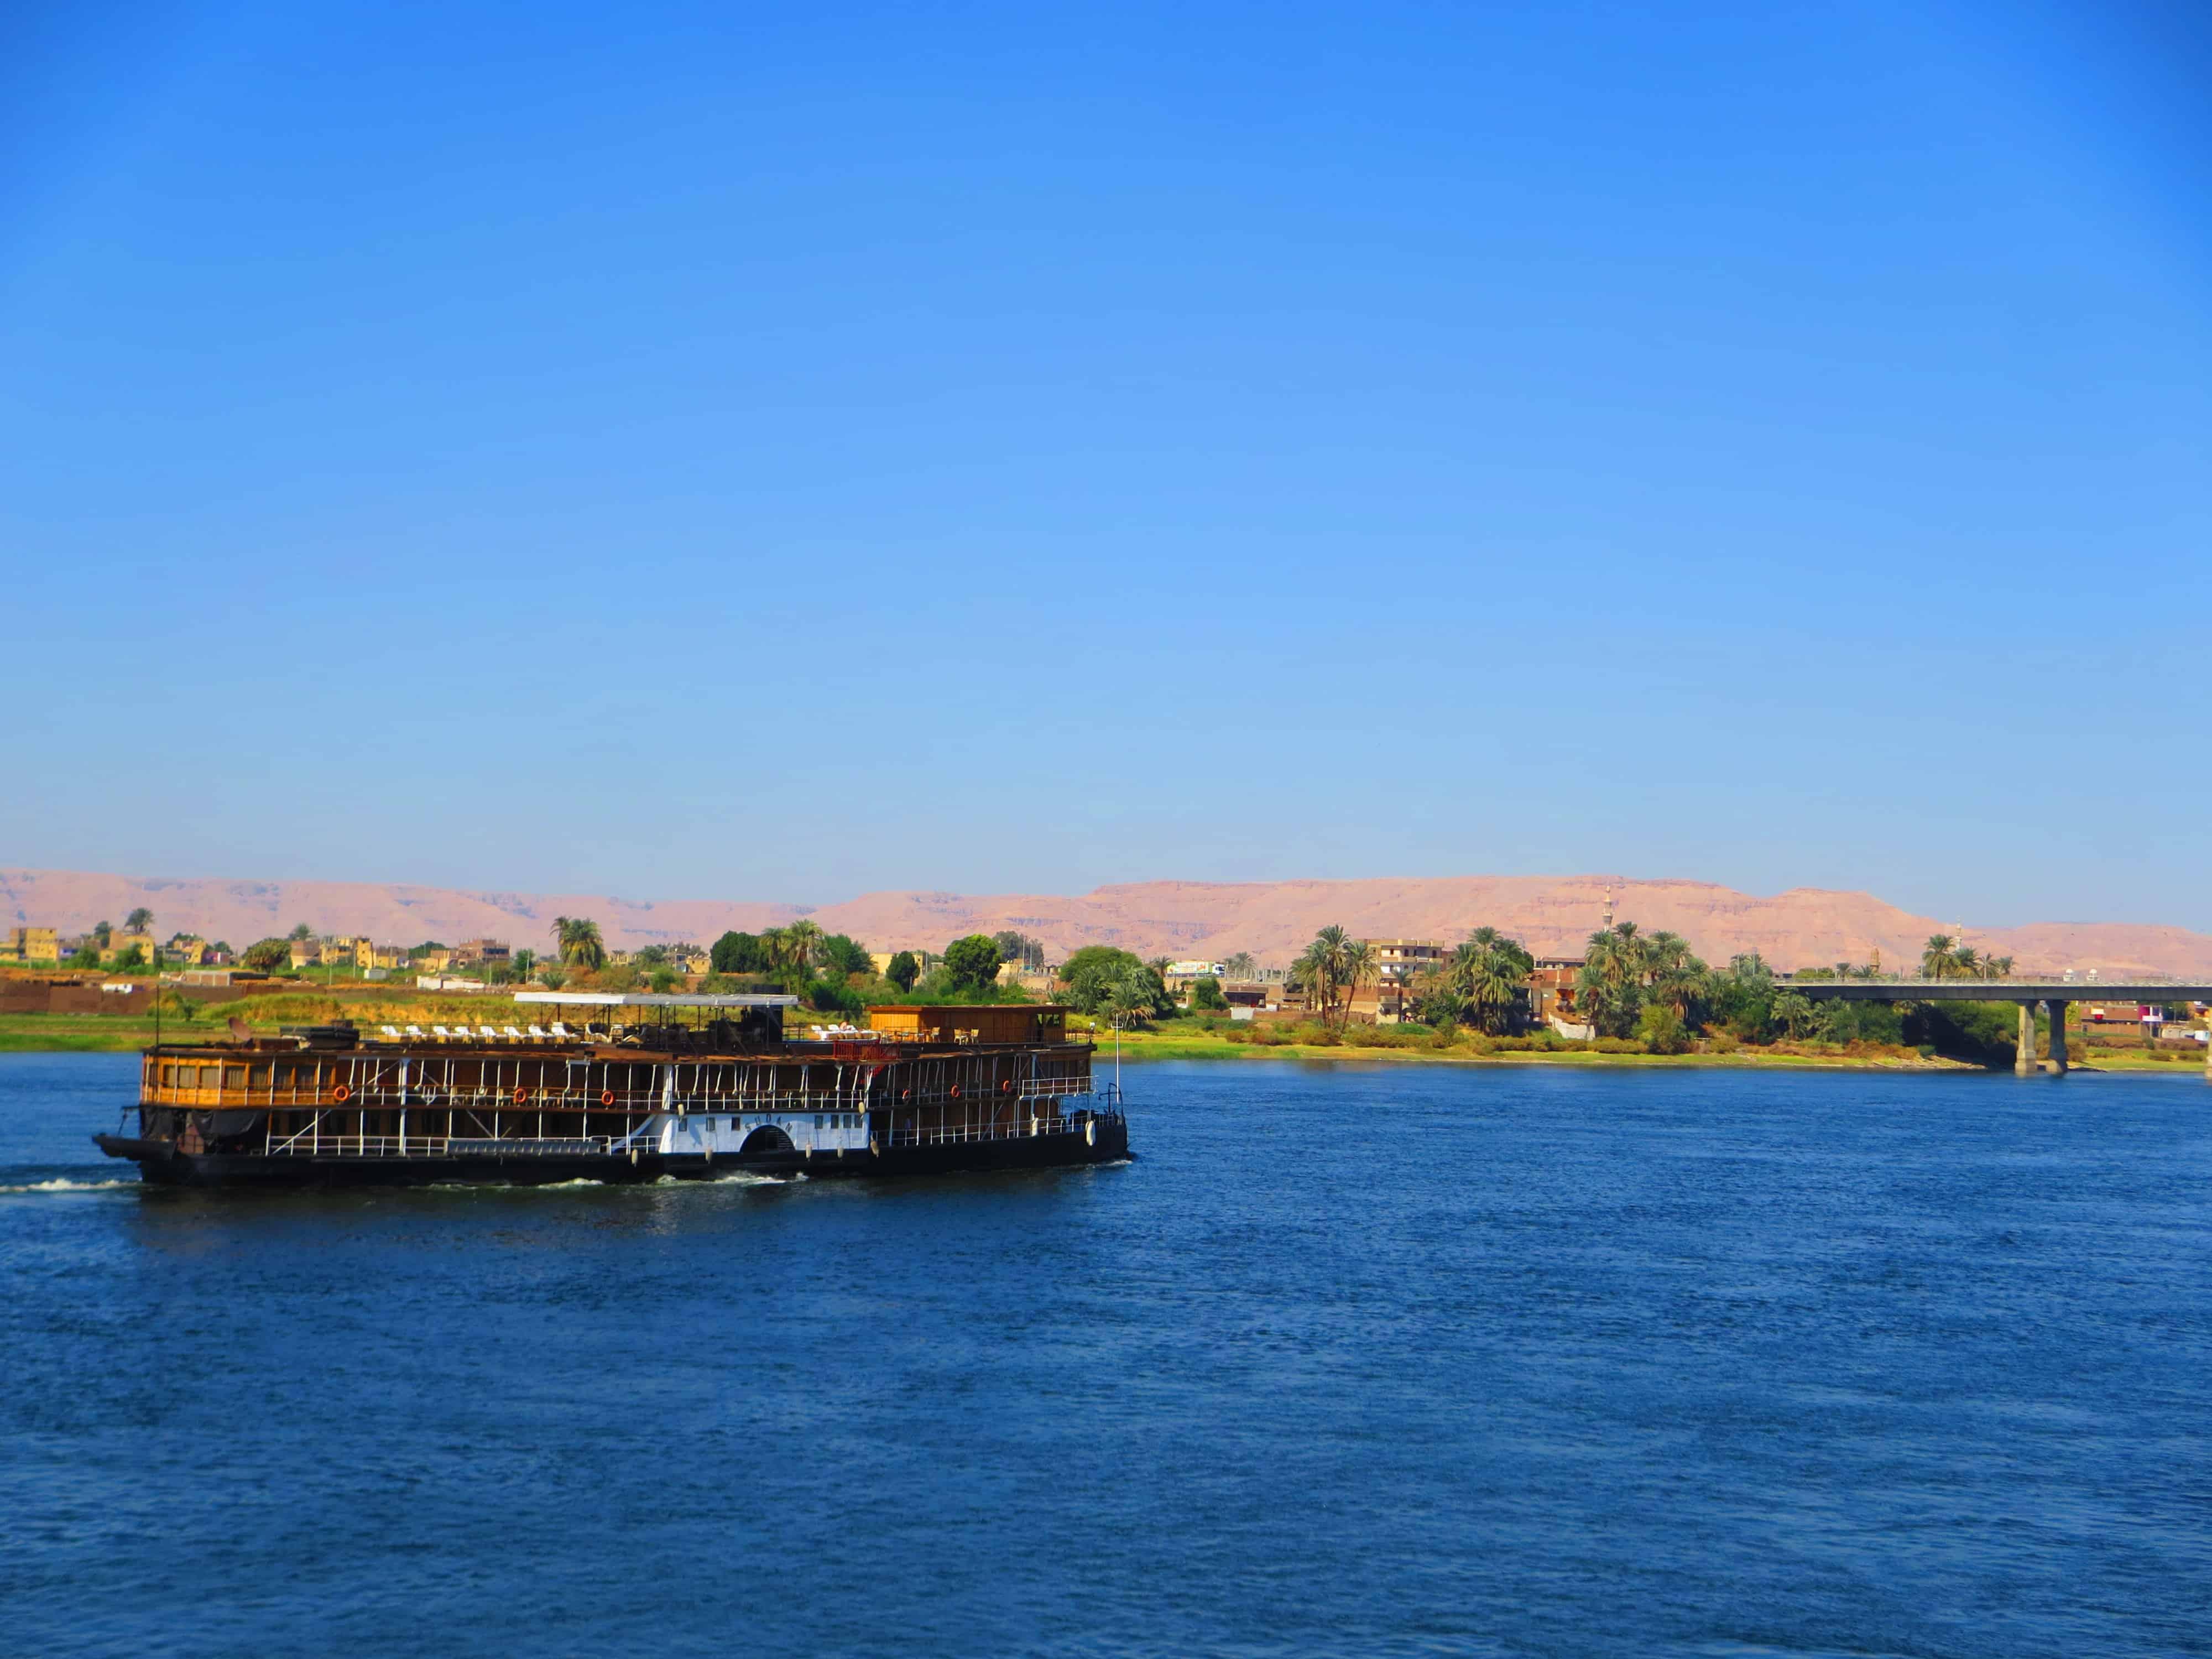 00_Nilkreuzfahrtschiff-SS-Sudan-Luxor-Nilkreuzfahrt-Aegypten